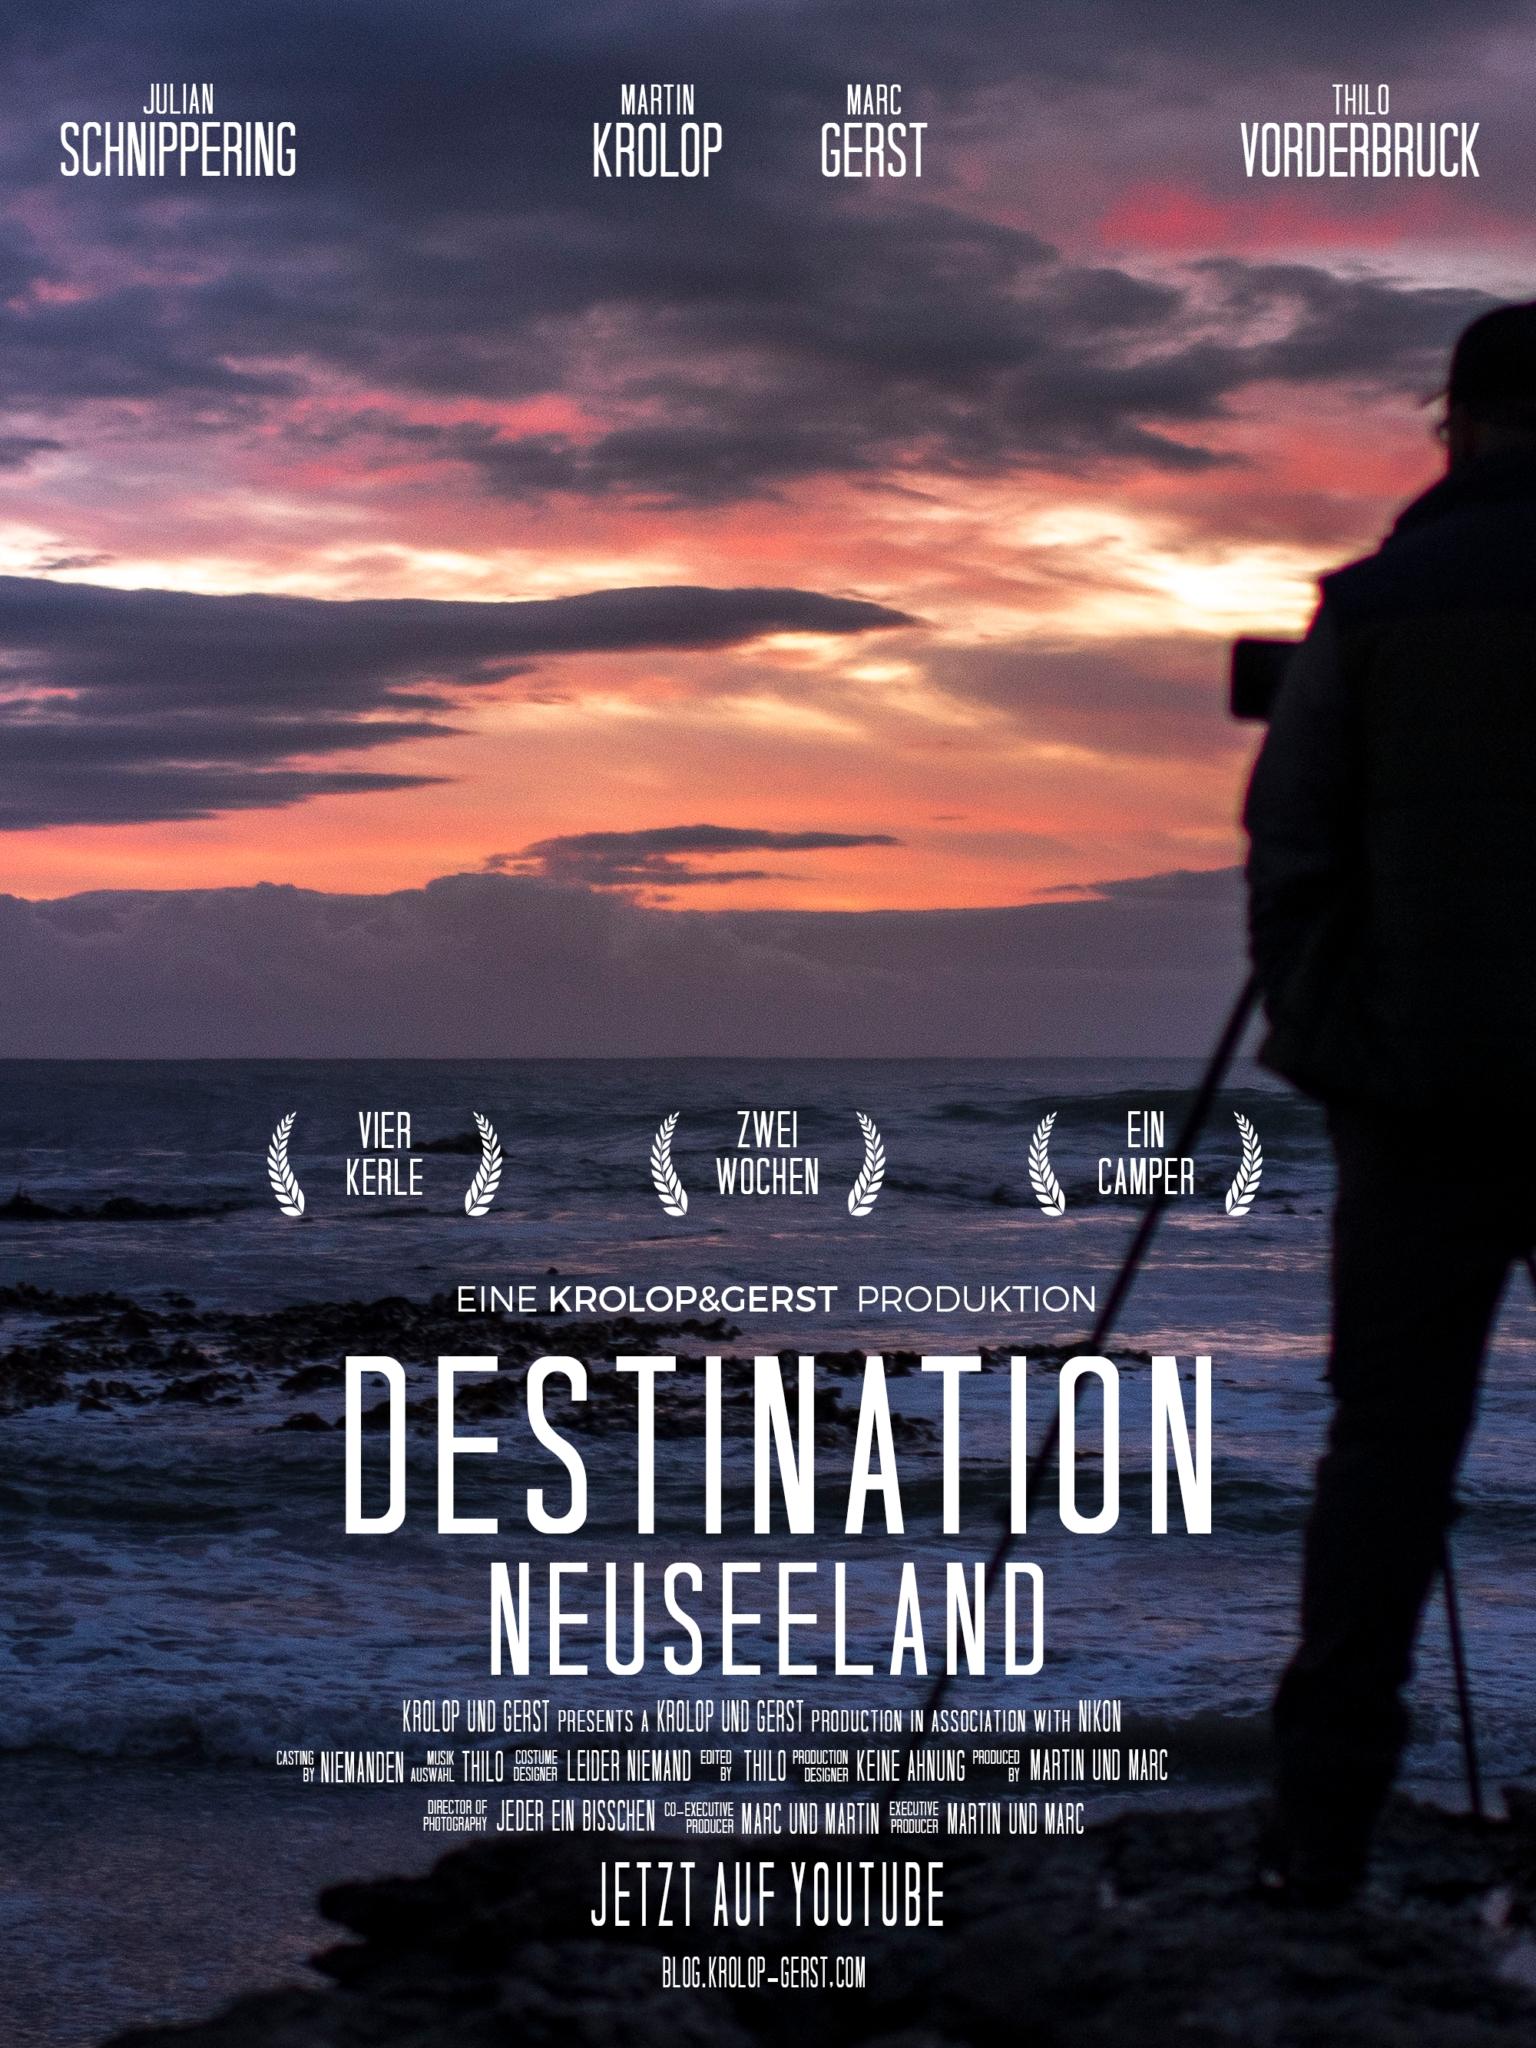 DESTINATION NEUSEELAND